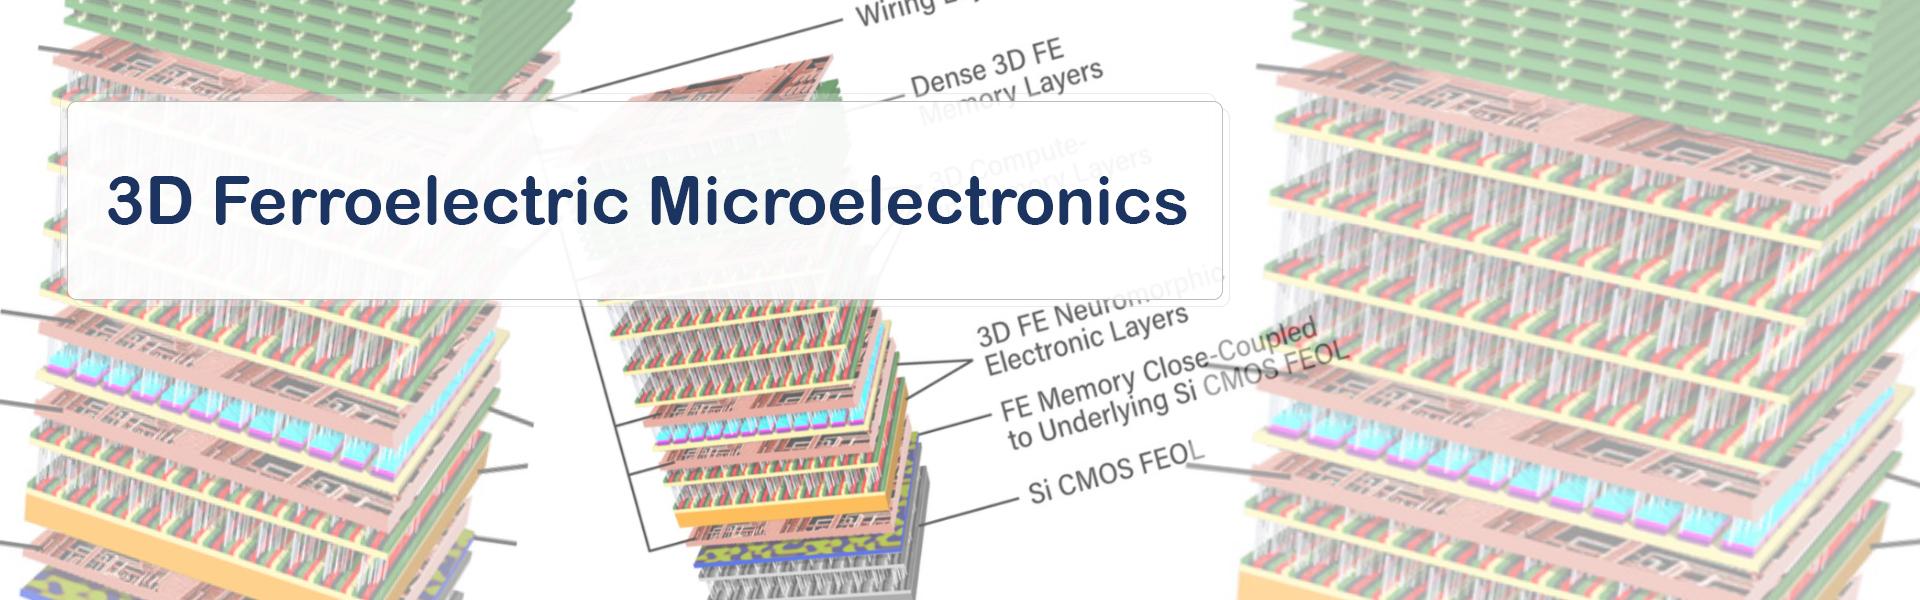 3D Ferroelectric Microelectronics